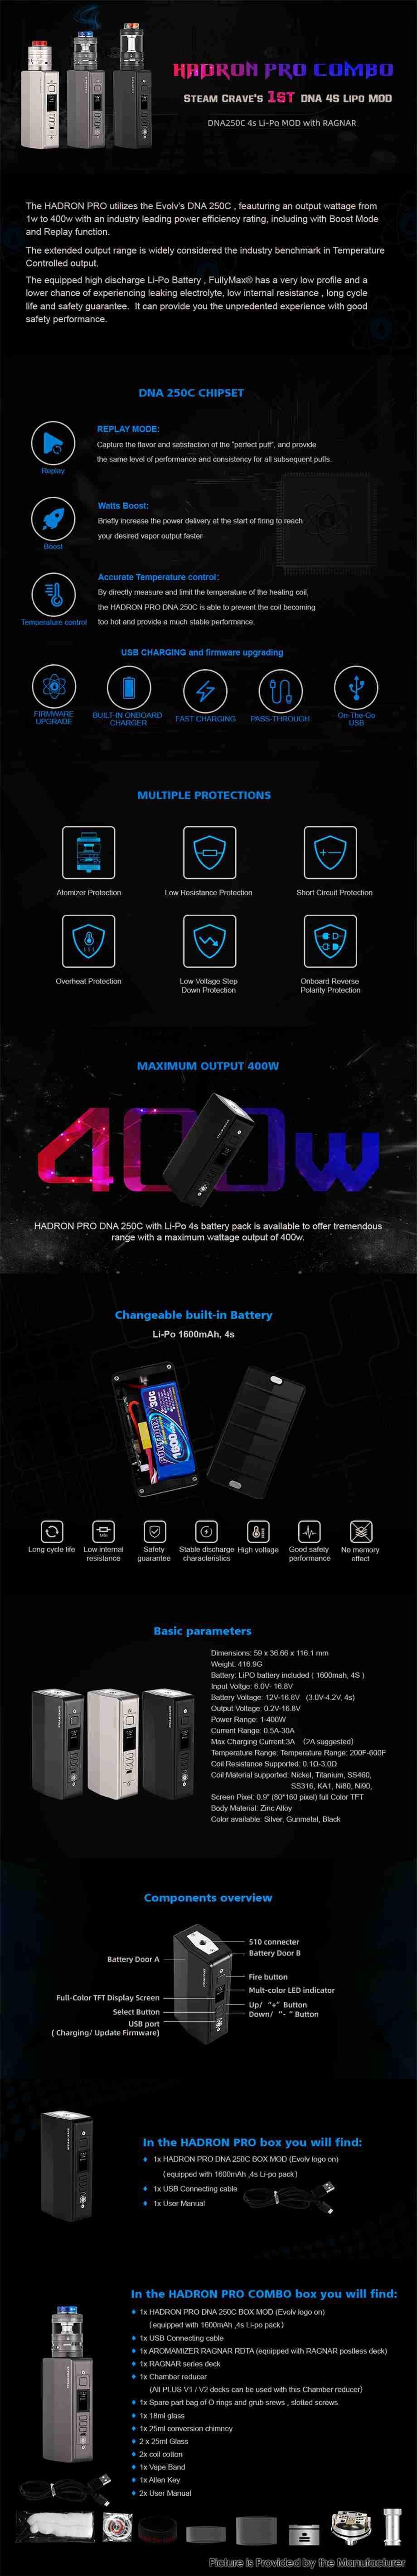 Authentic Steam Crave Hadron Pro Combo Kit DNA 250C Mod +Aromamizer Ragnar RDTA